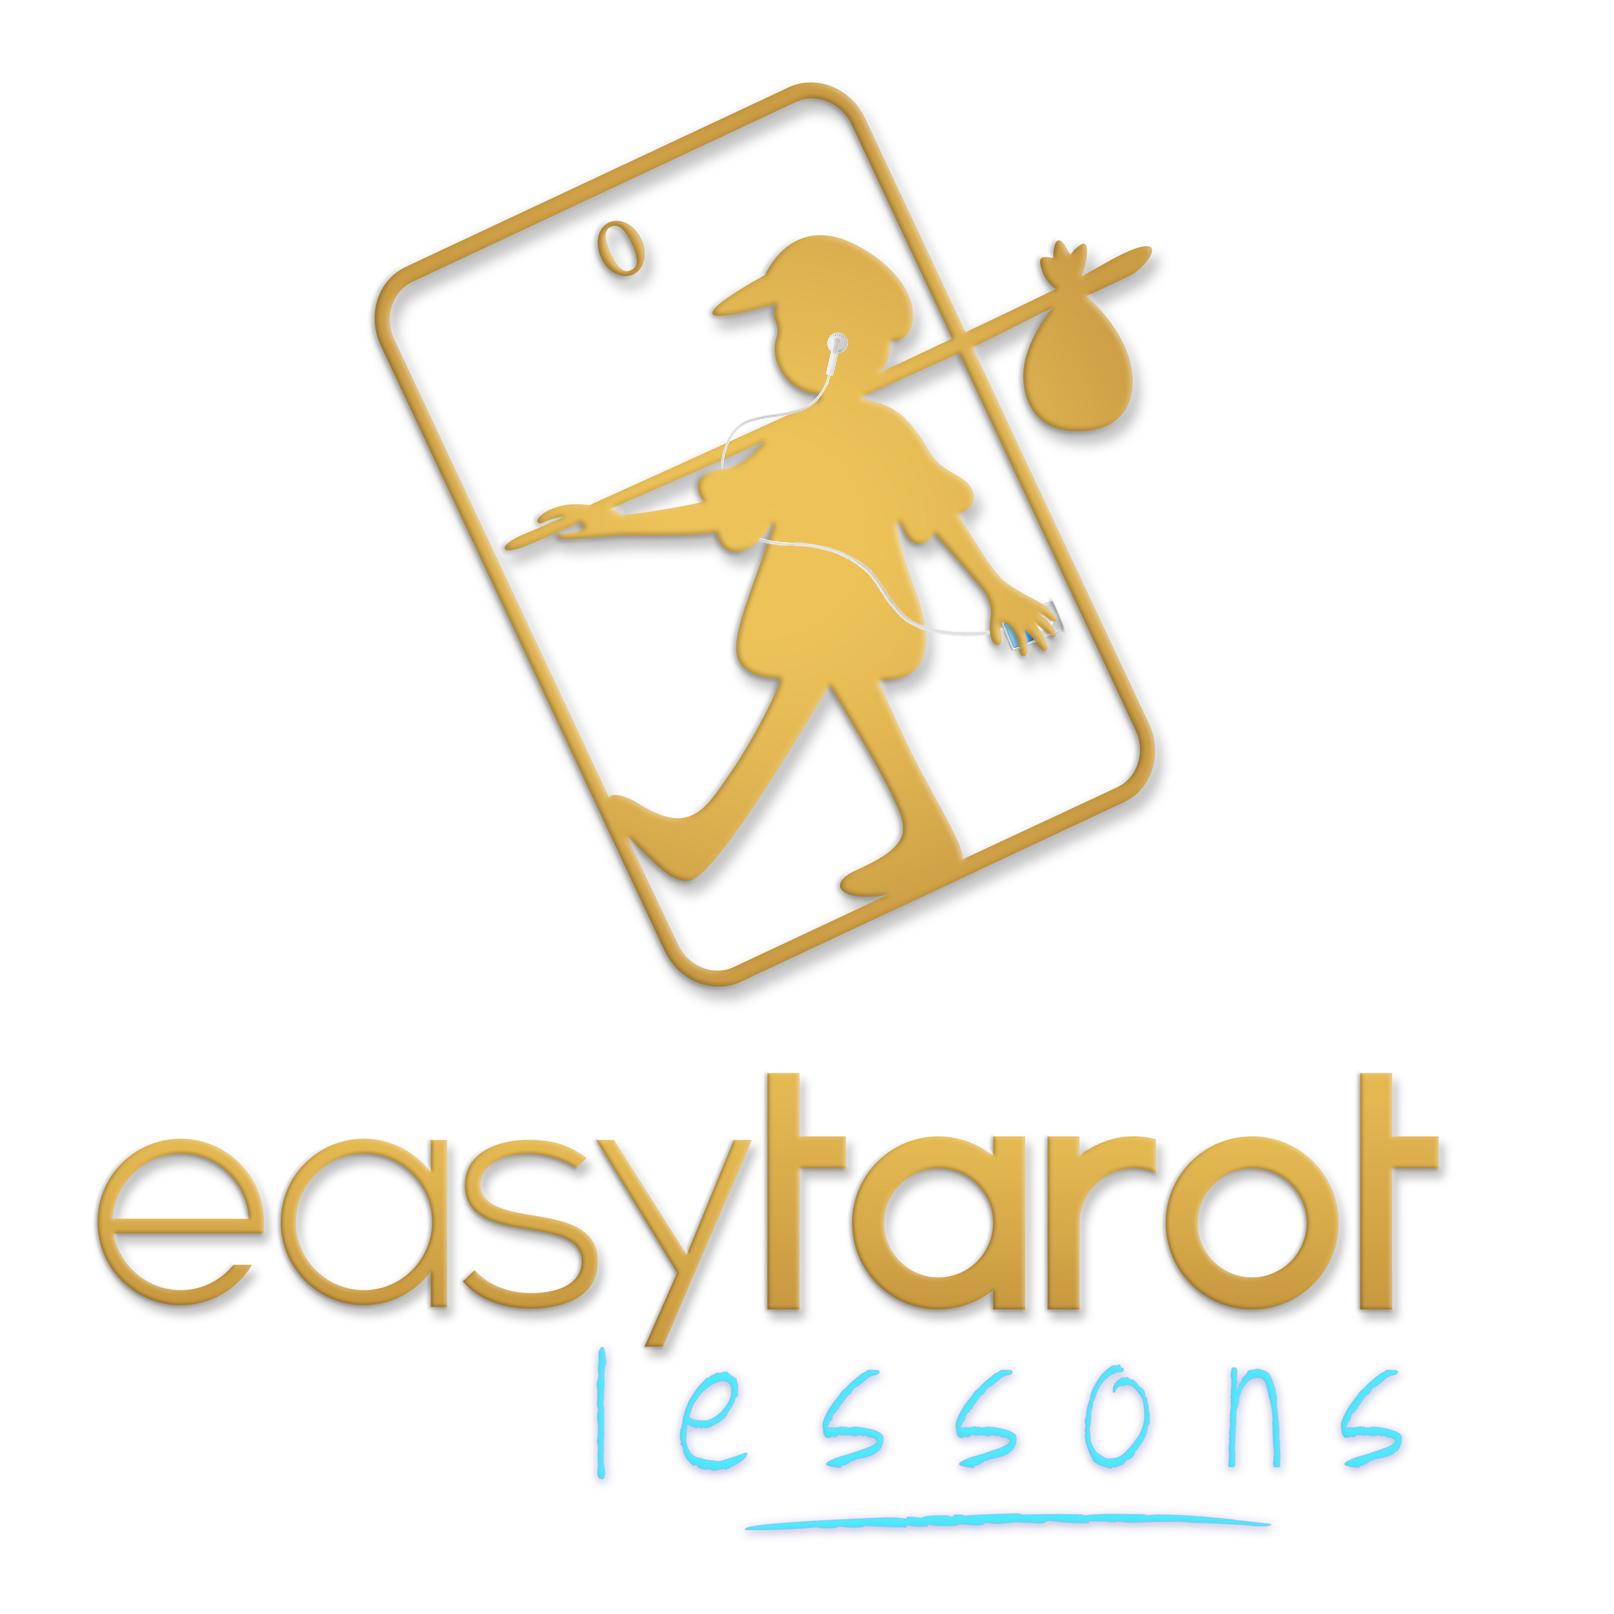 Easy Tarot Lessons!